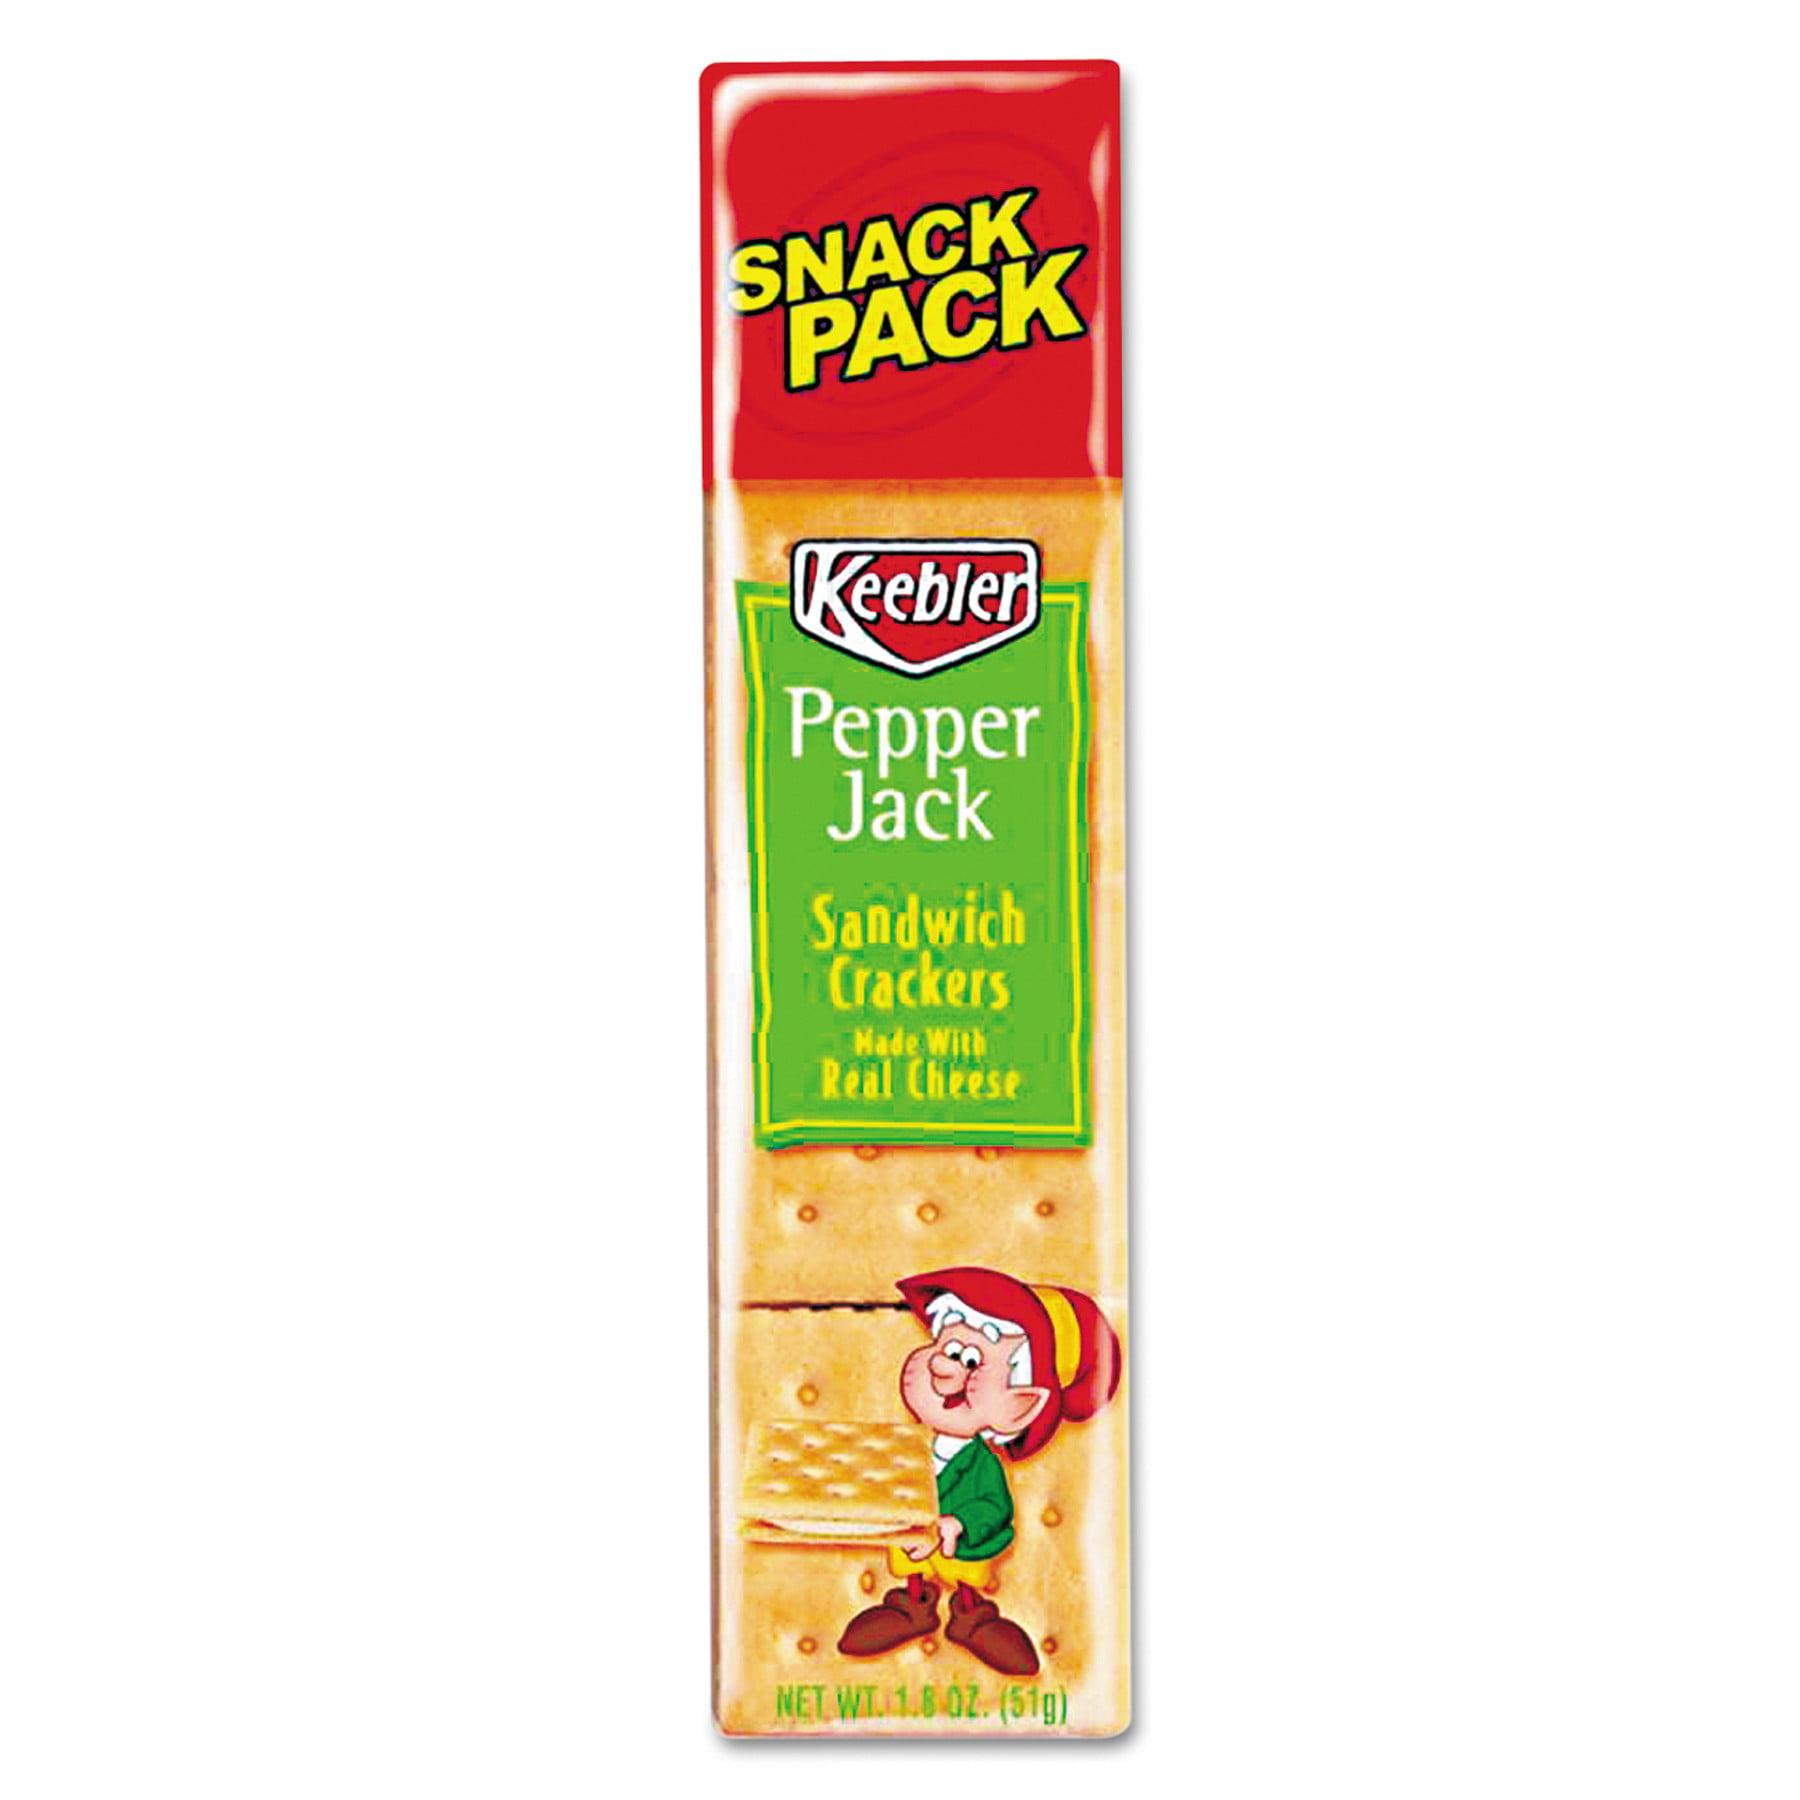 Keebler Pepper Jack Cheese Sandwich Crackers, Single Serve, 1.8 oz Package